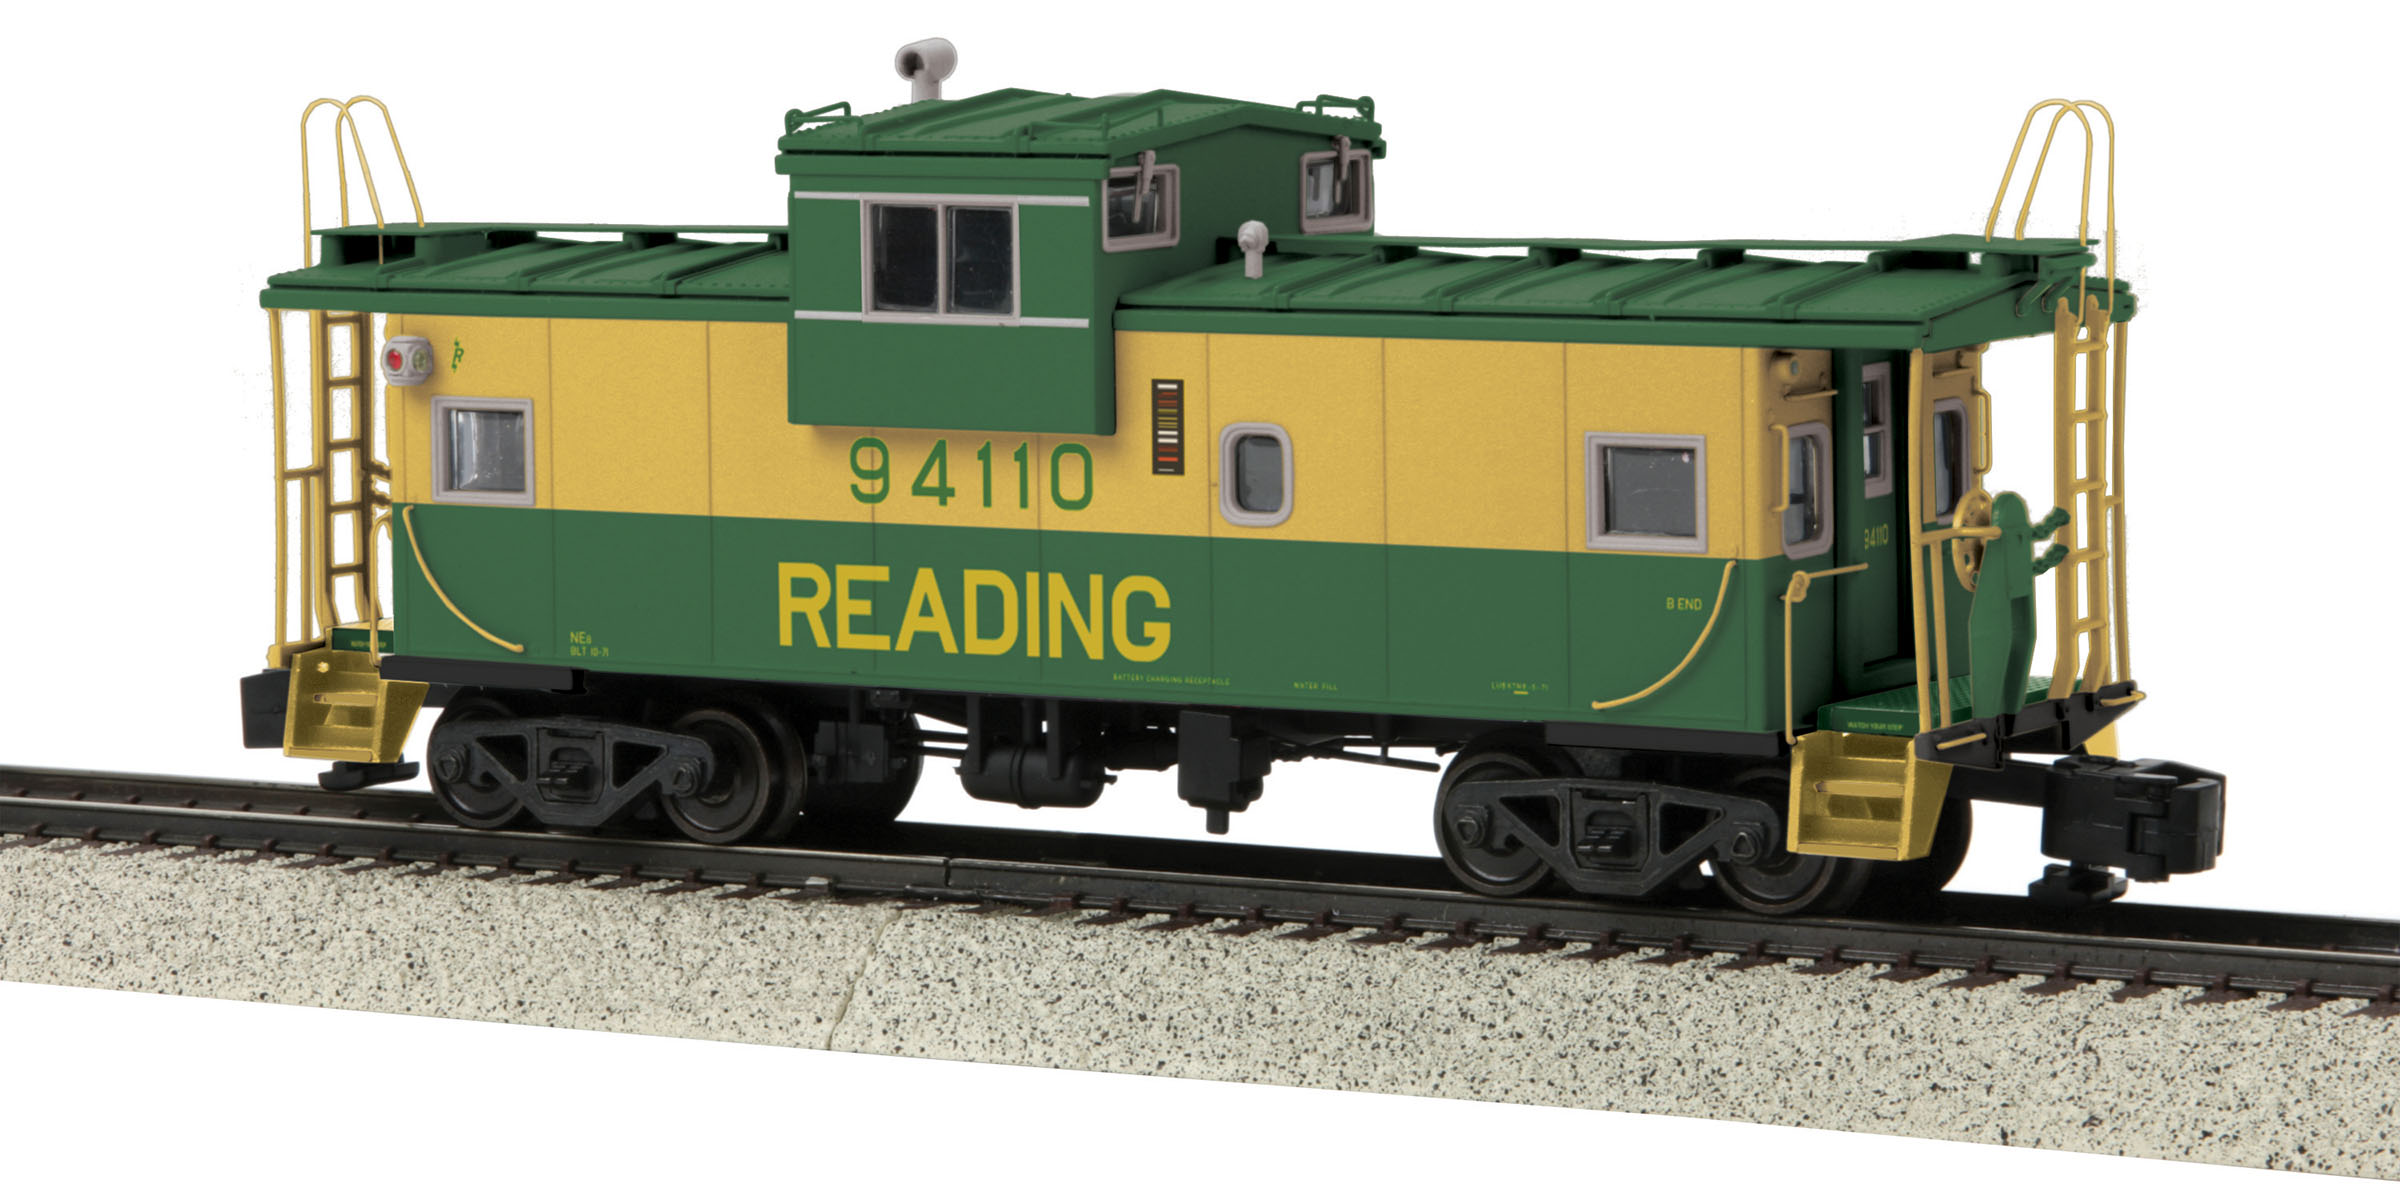 MTH 3577005 Extended Vision Caboose Hi-Rail Wheels RDG #94110